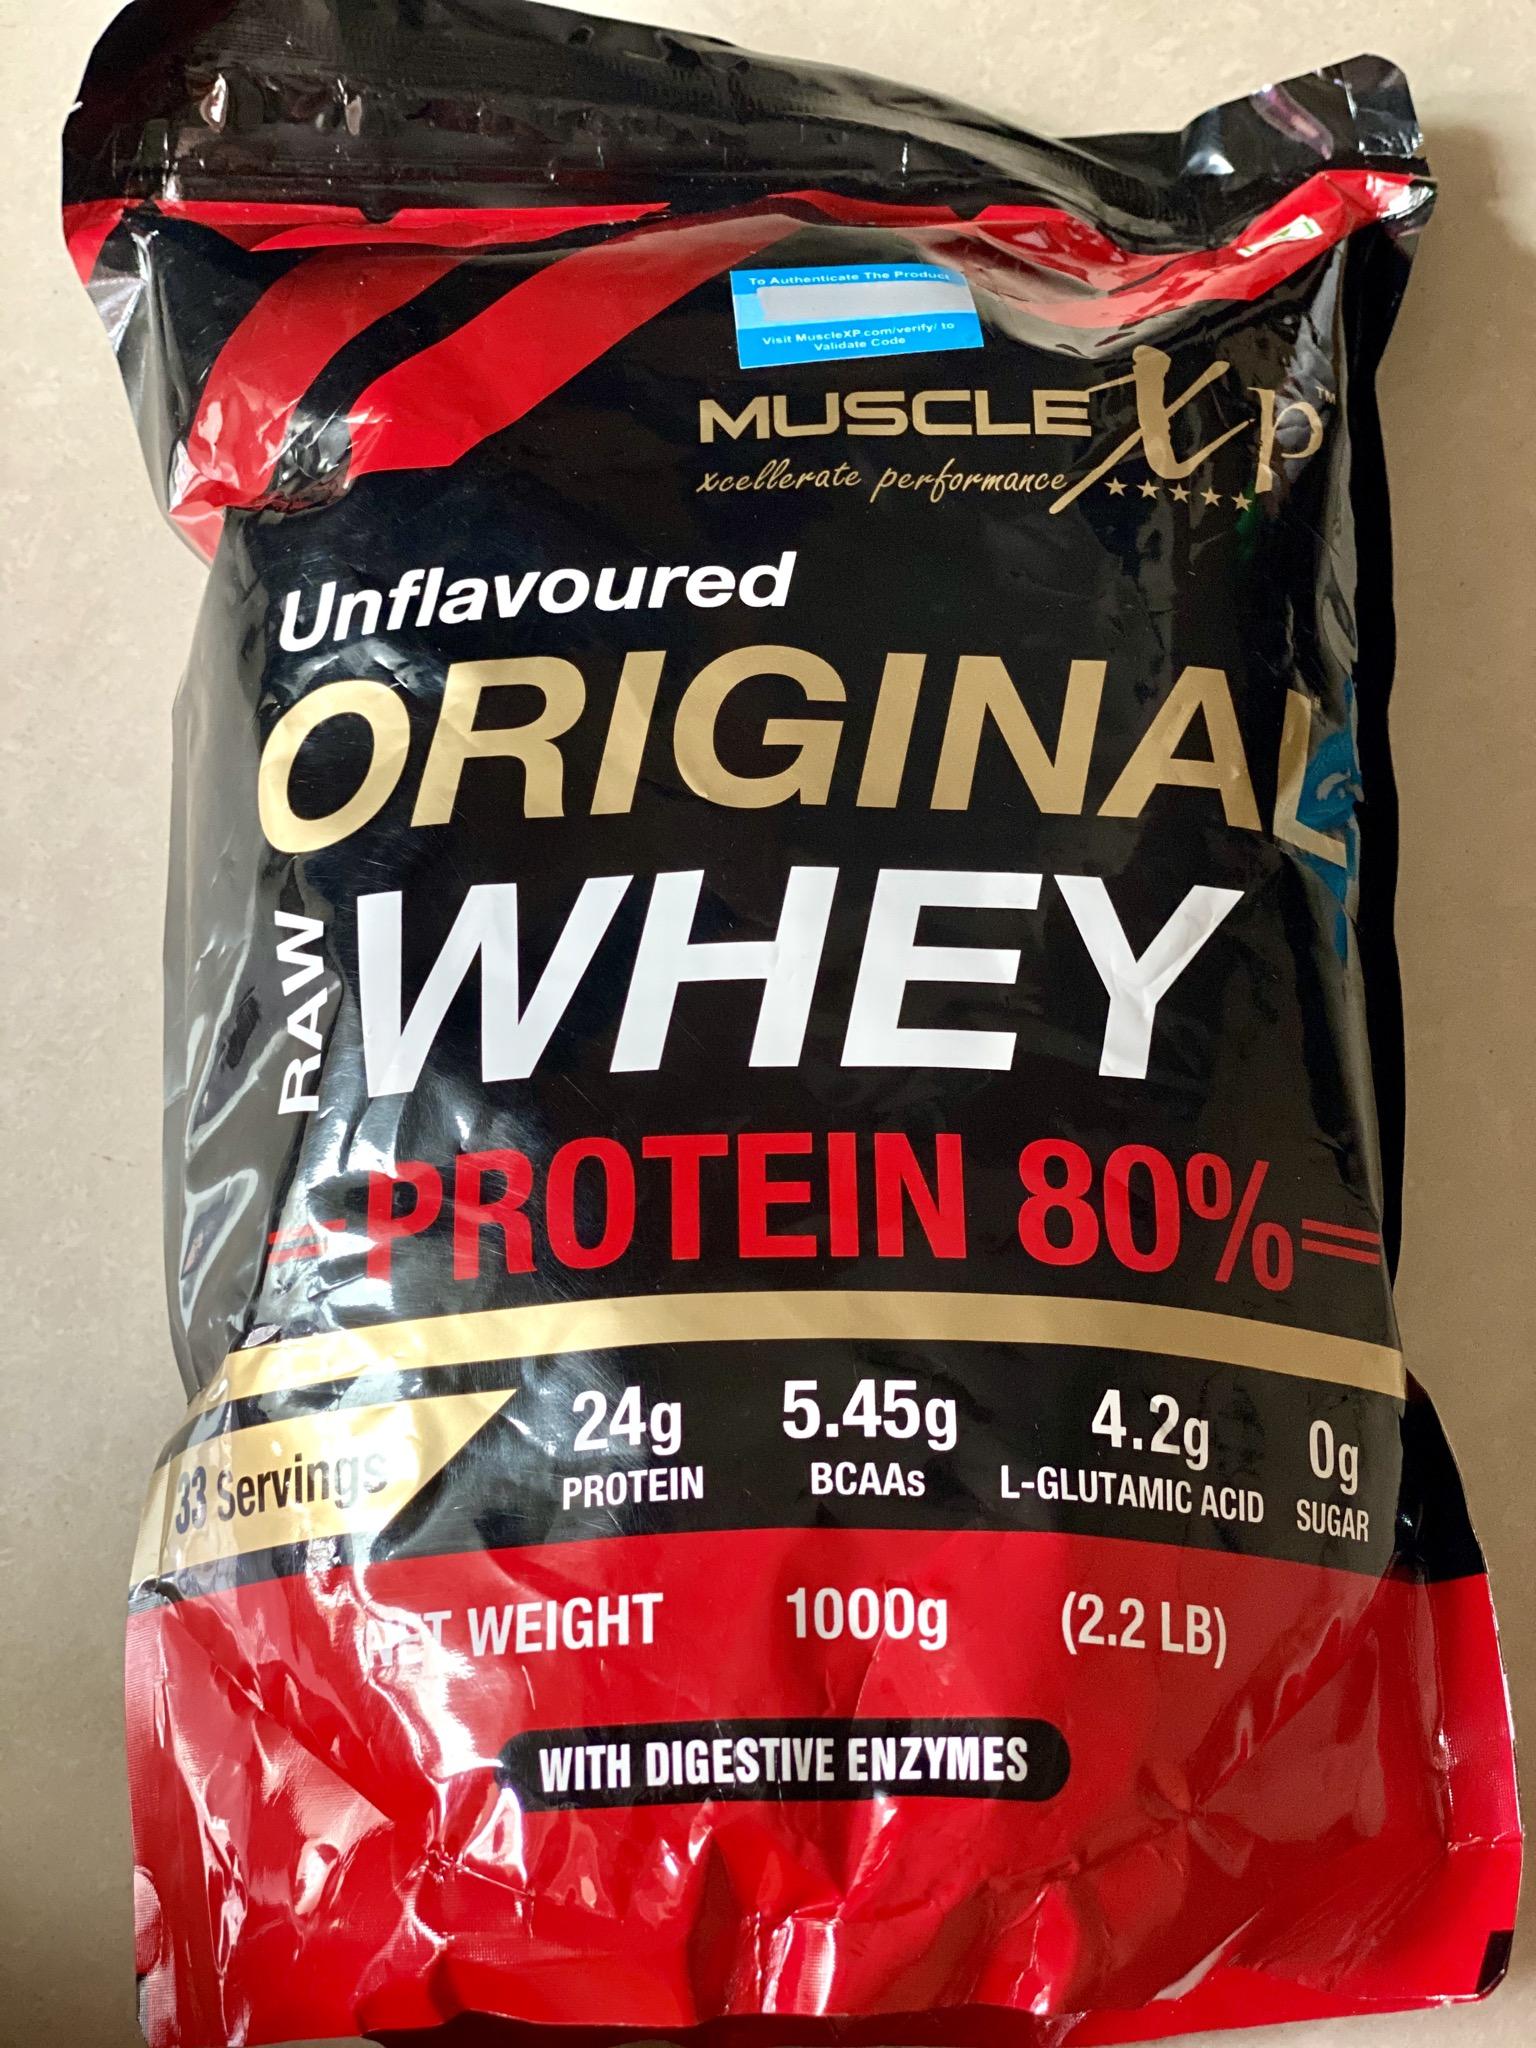 MuscleXP Raw Whey Protein 80% Powder Unflavoured -Best raw whey protein-By yogita_parmar